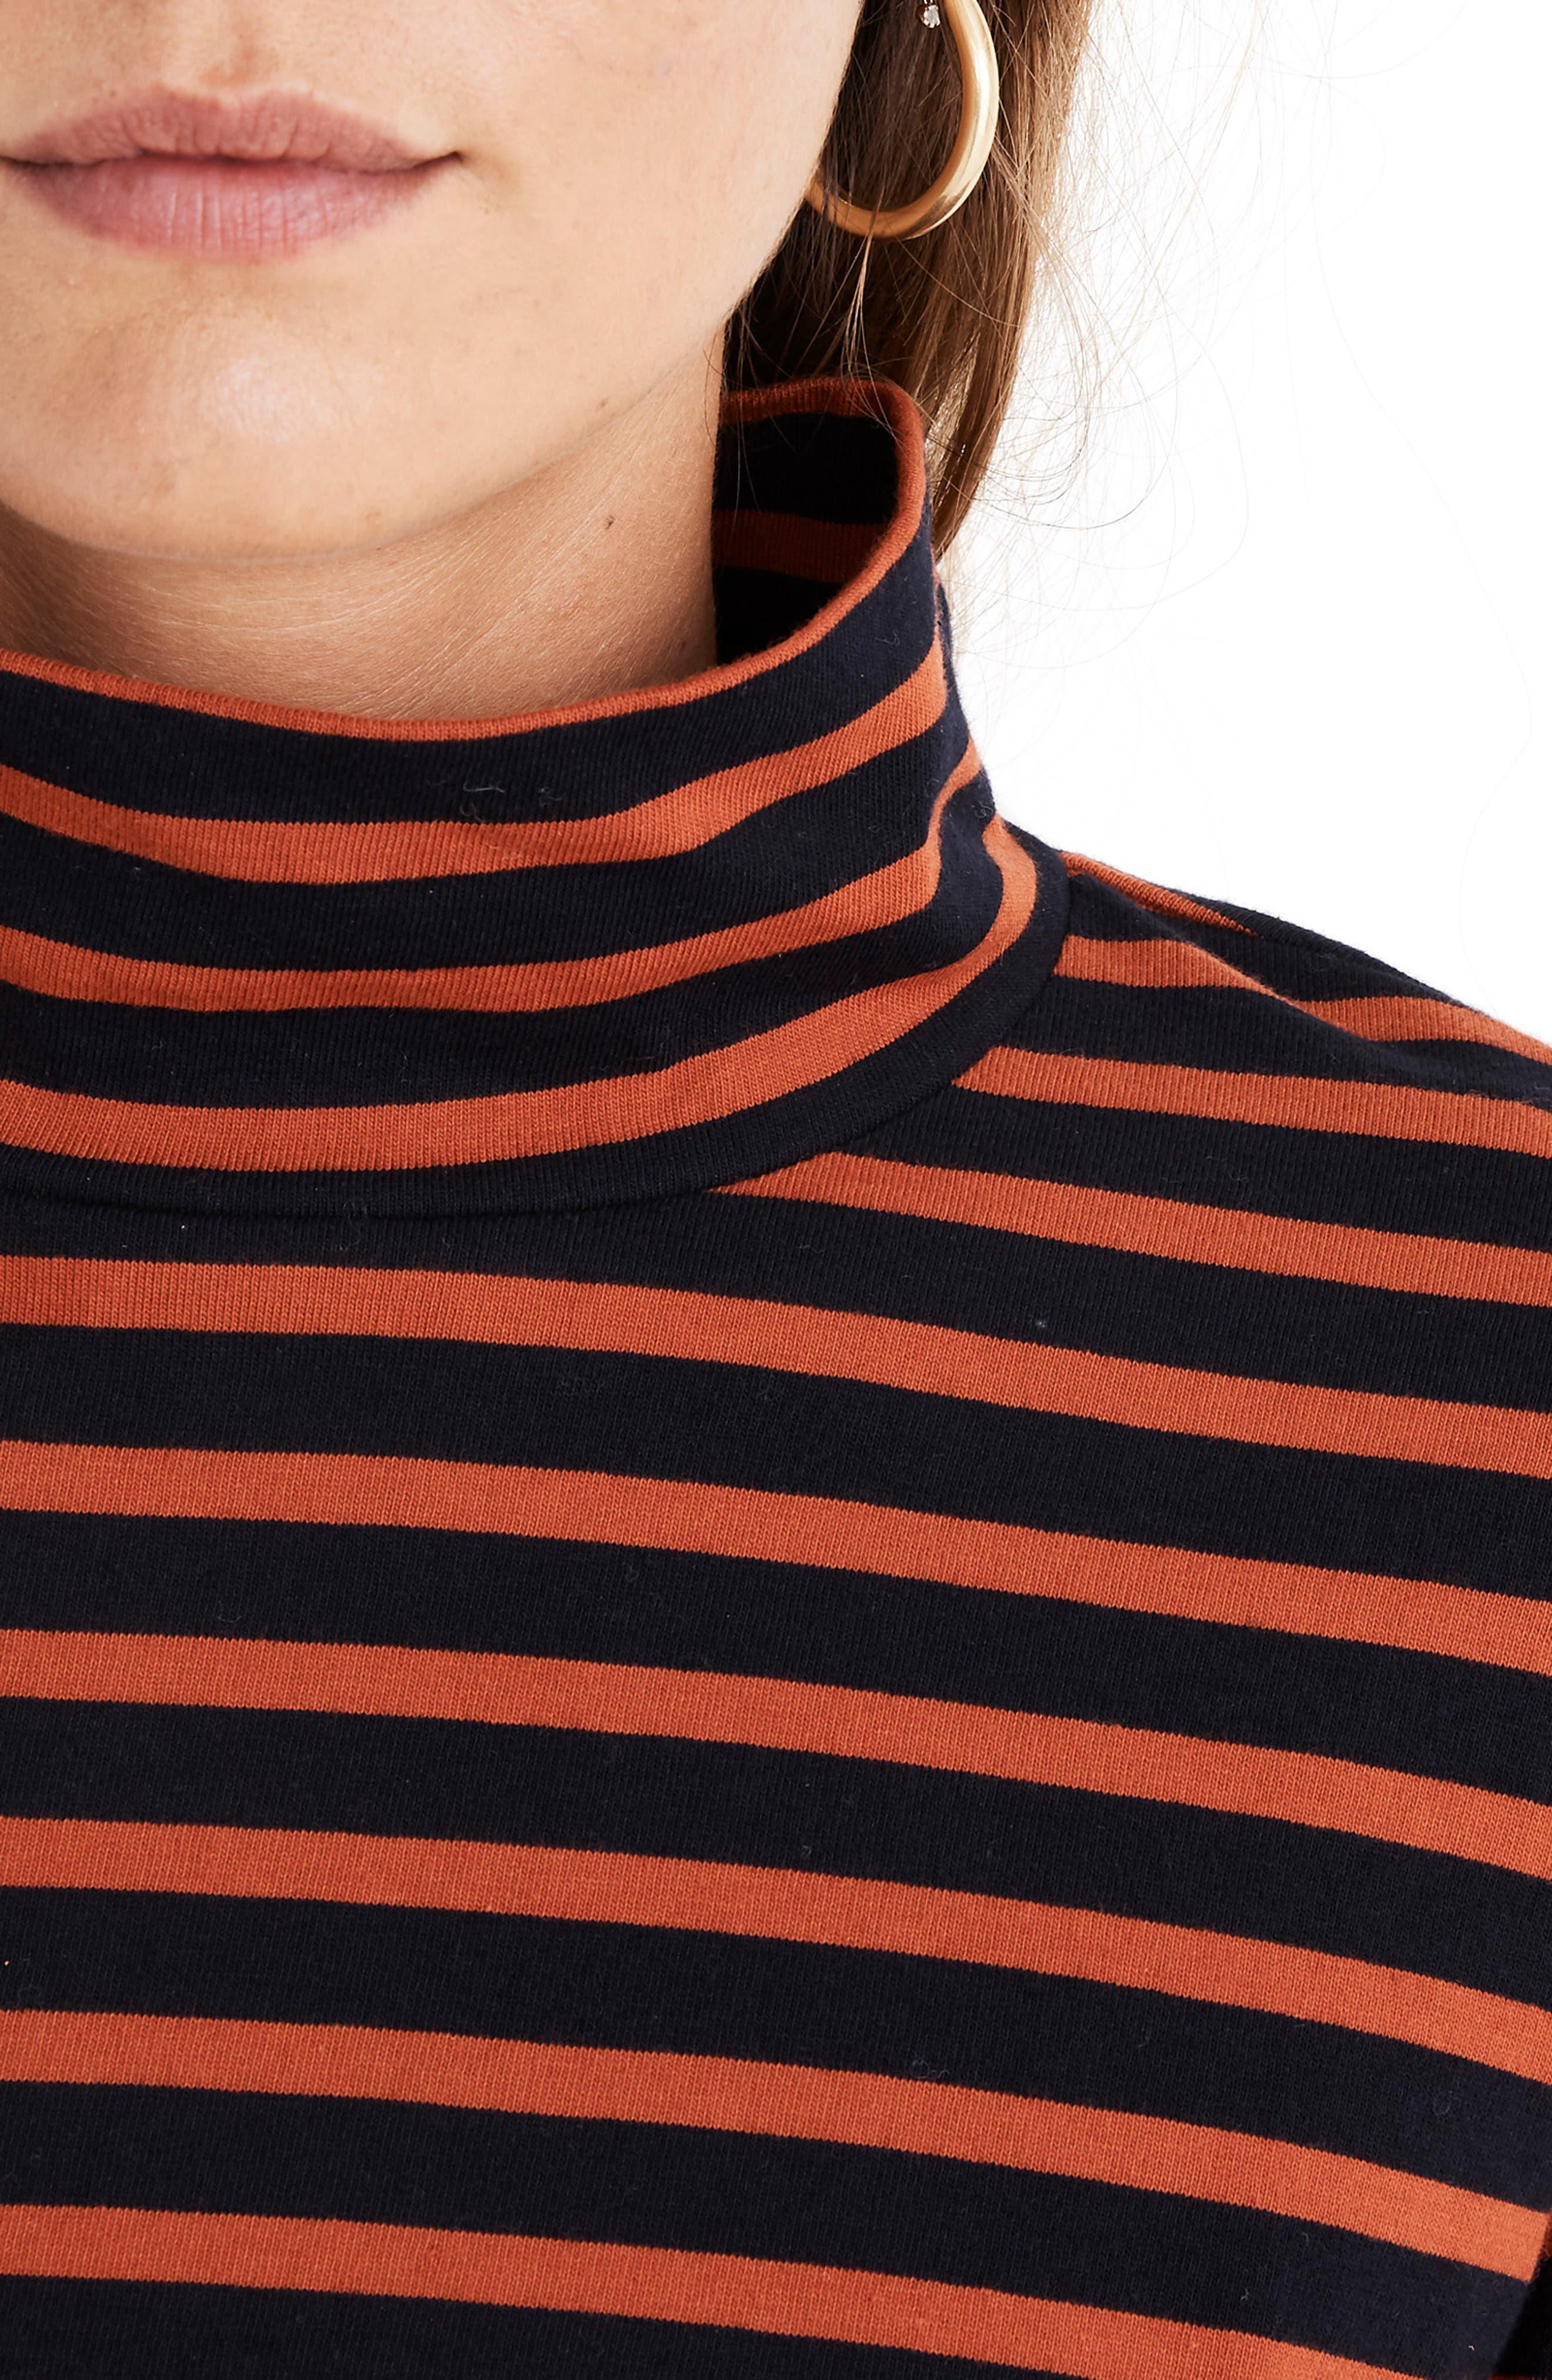 MADEWELL,                             Stripe Wide Sleeve Turtleneck,                             Alternate thumbnail 4, color,                             400